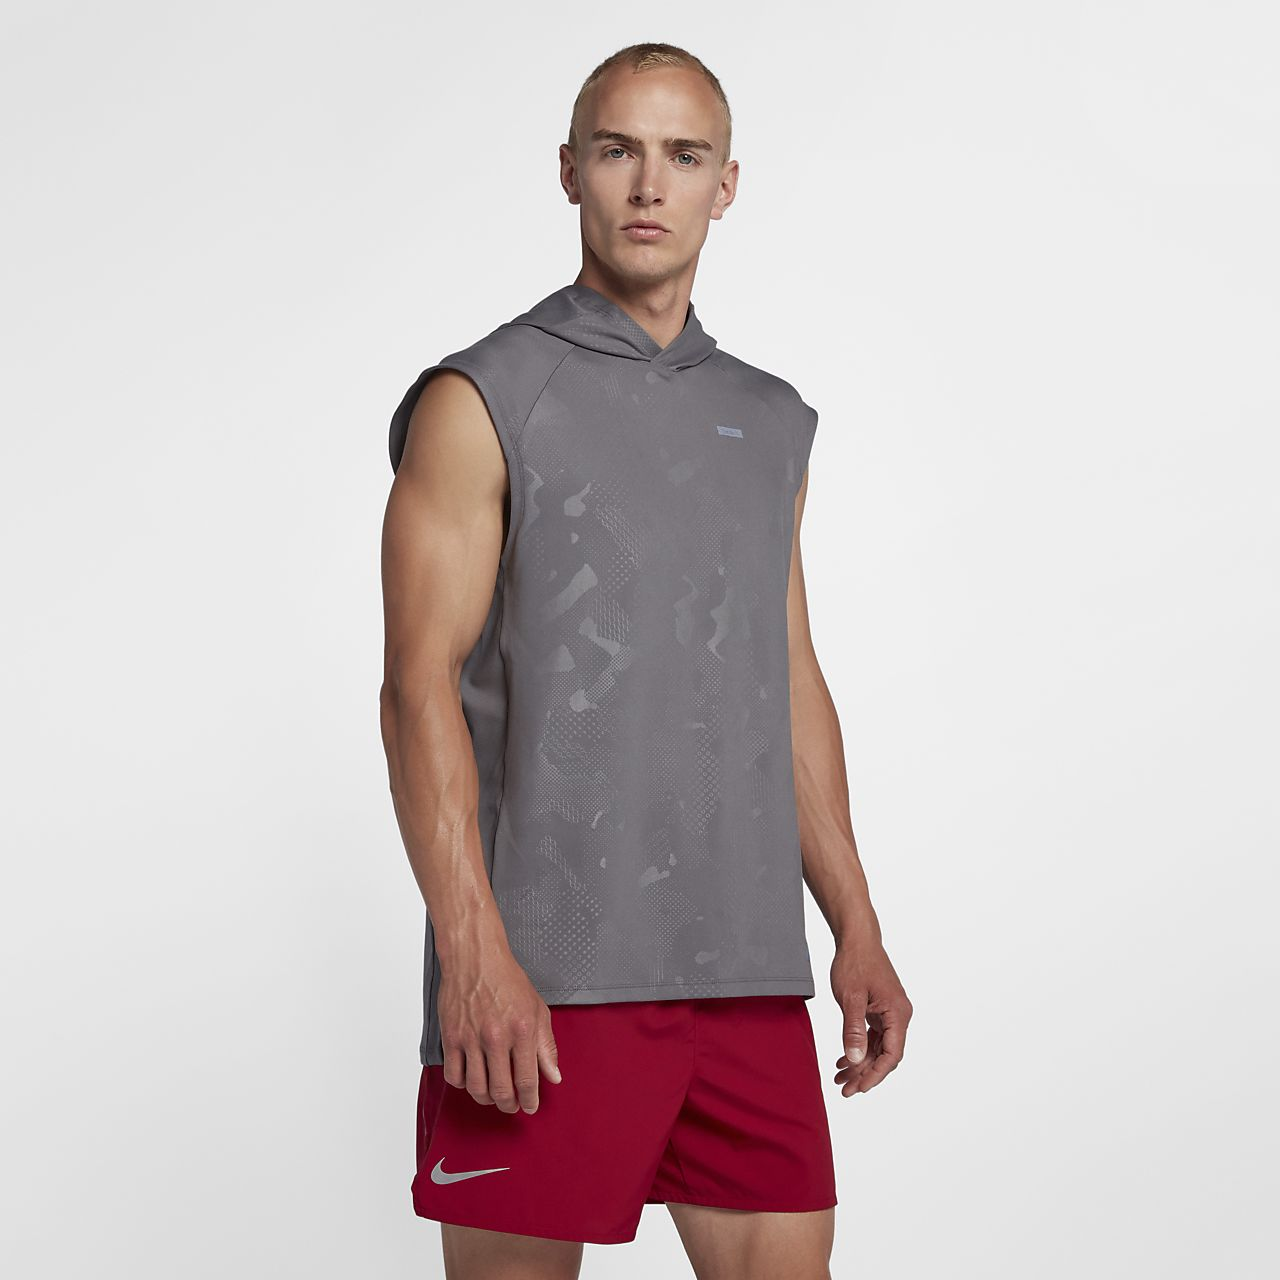 9d0e41582017e9 Low Resolution Nike Men s Sleeveless Running Hoodie Nike Men s Sleeveless  Running Hoodie